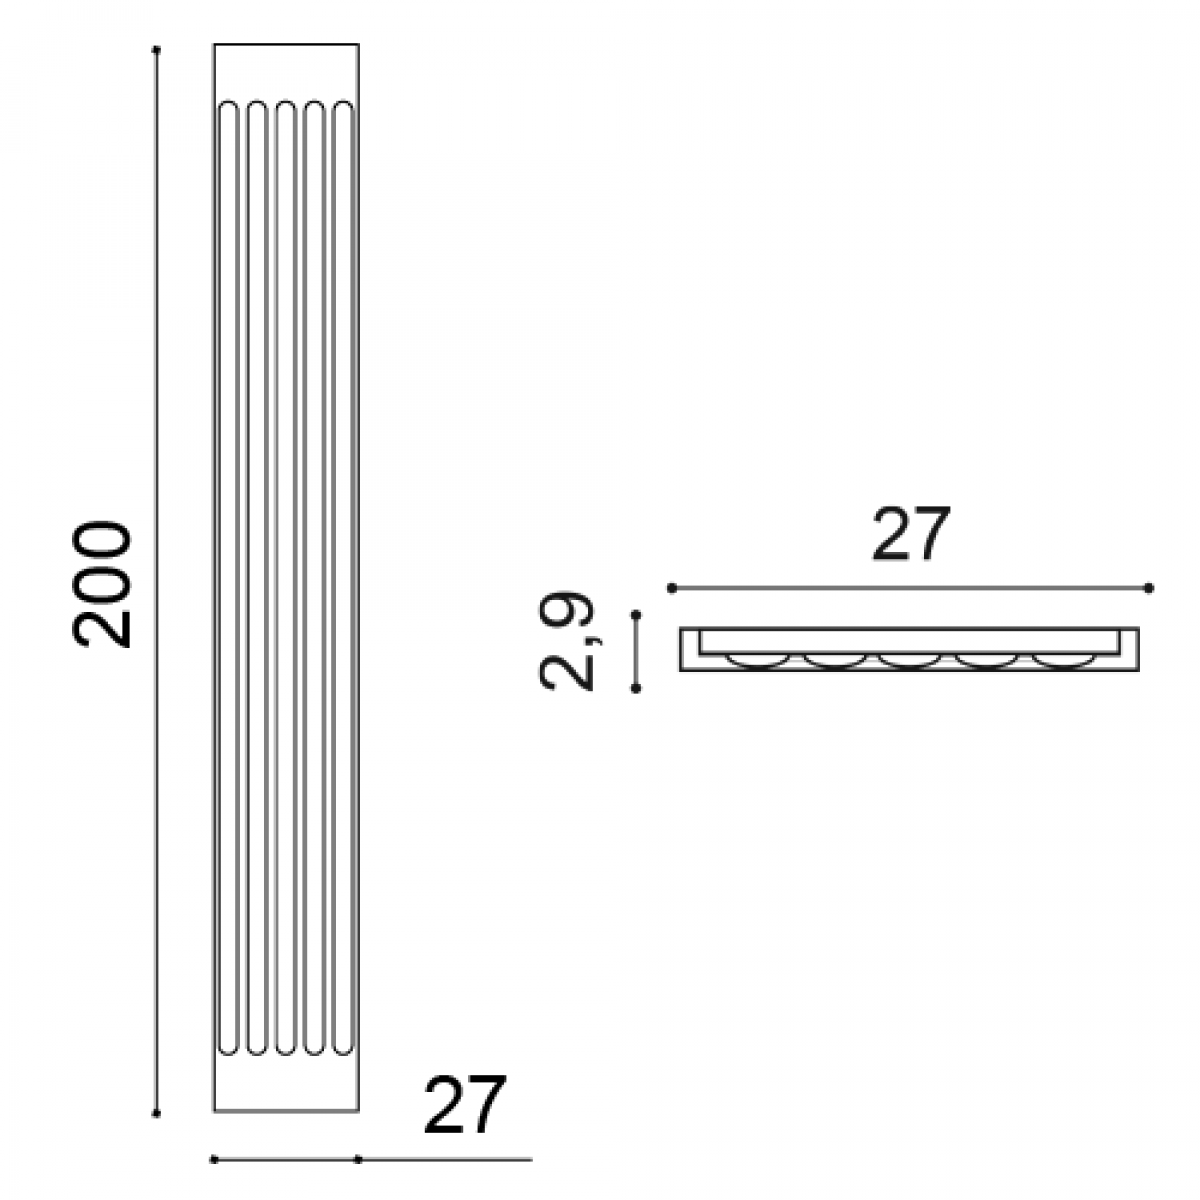 Pilastru Luxxus K250, Dimensiuni: 27 X 2.9 X 200 cm, Orac Decor